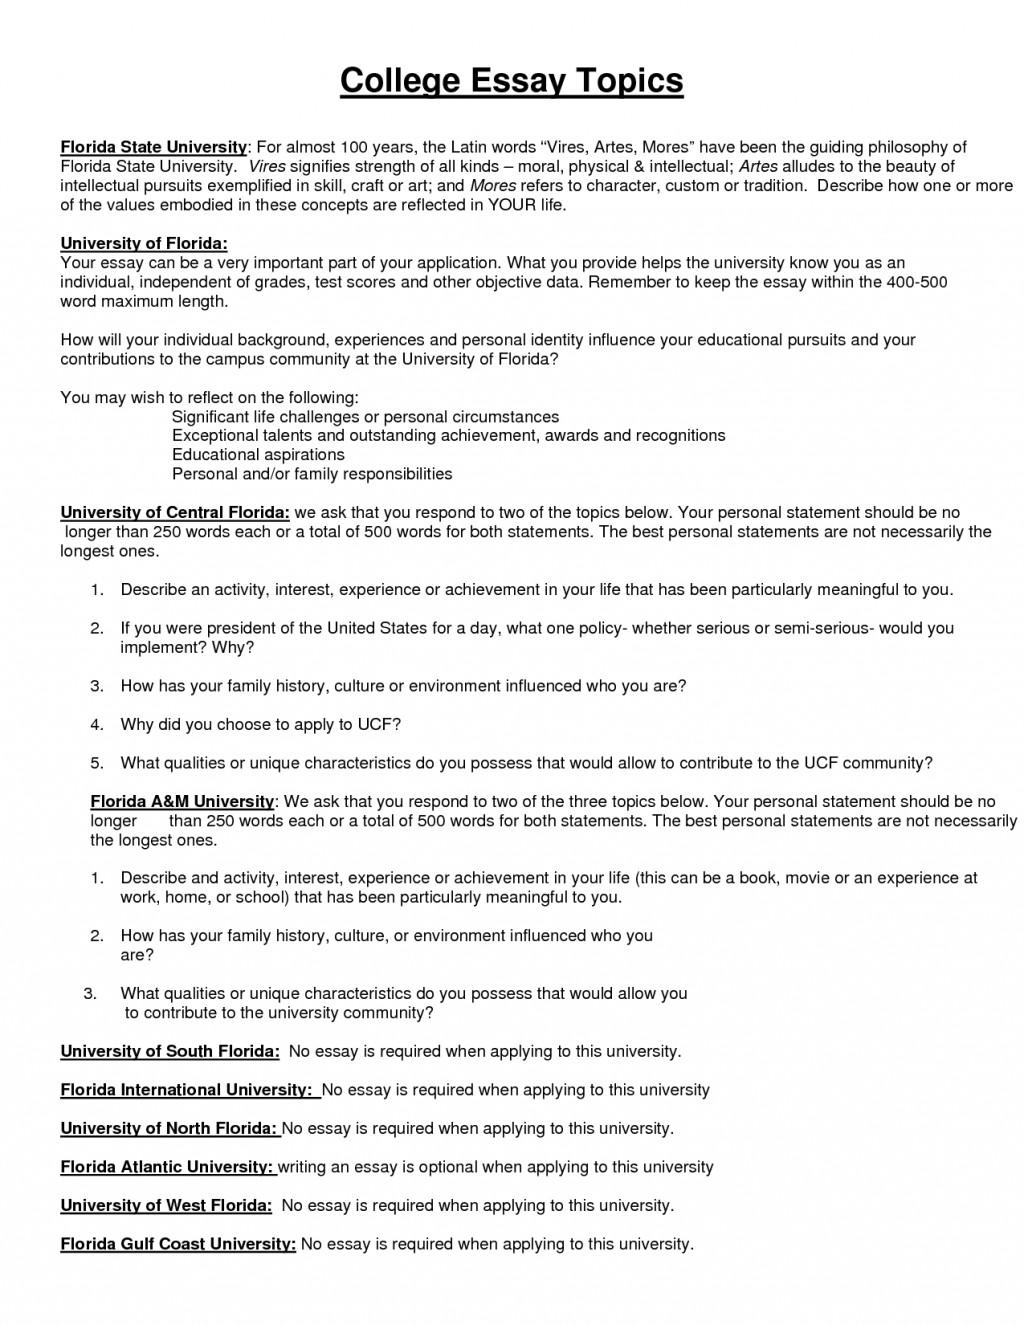 003 Essay Example 4khqbt5dlt Creative College Marvelous Topics 2017 Unique 2018 Large